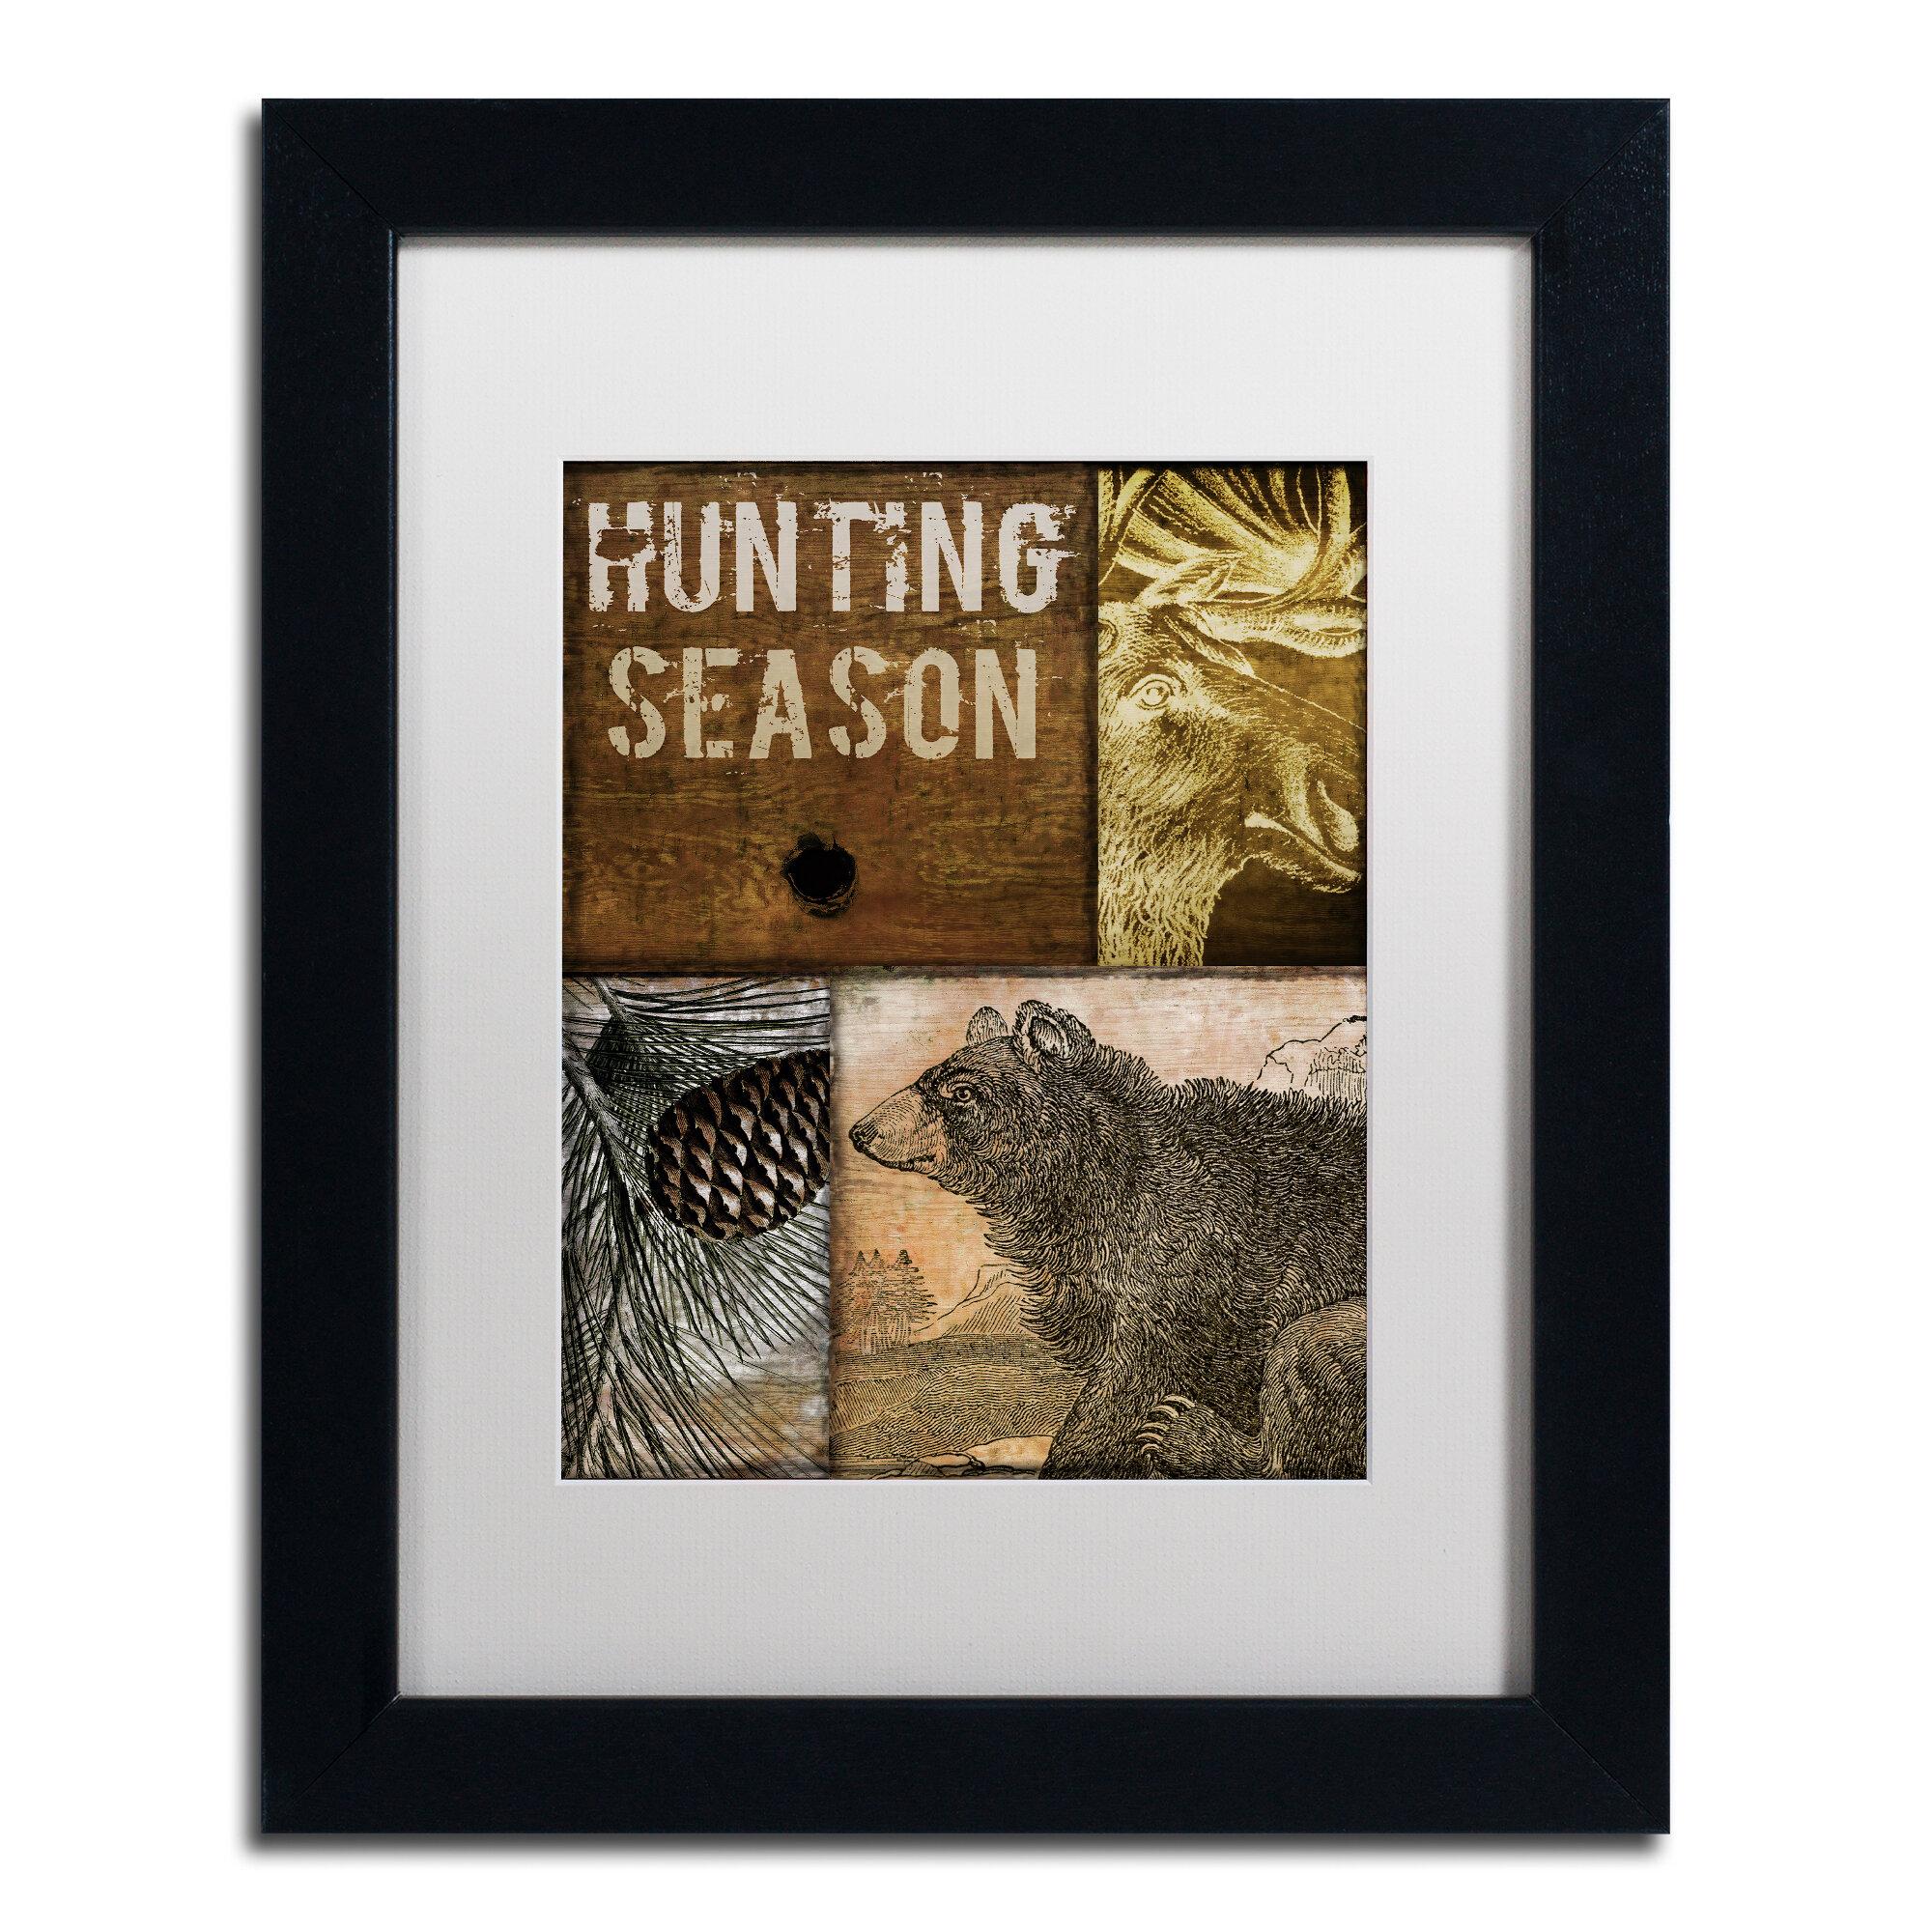 Trademark Art Hunting Season Iv By Color Bakery Framed Graphic Art Wayfair